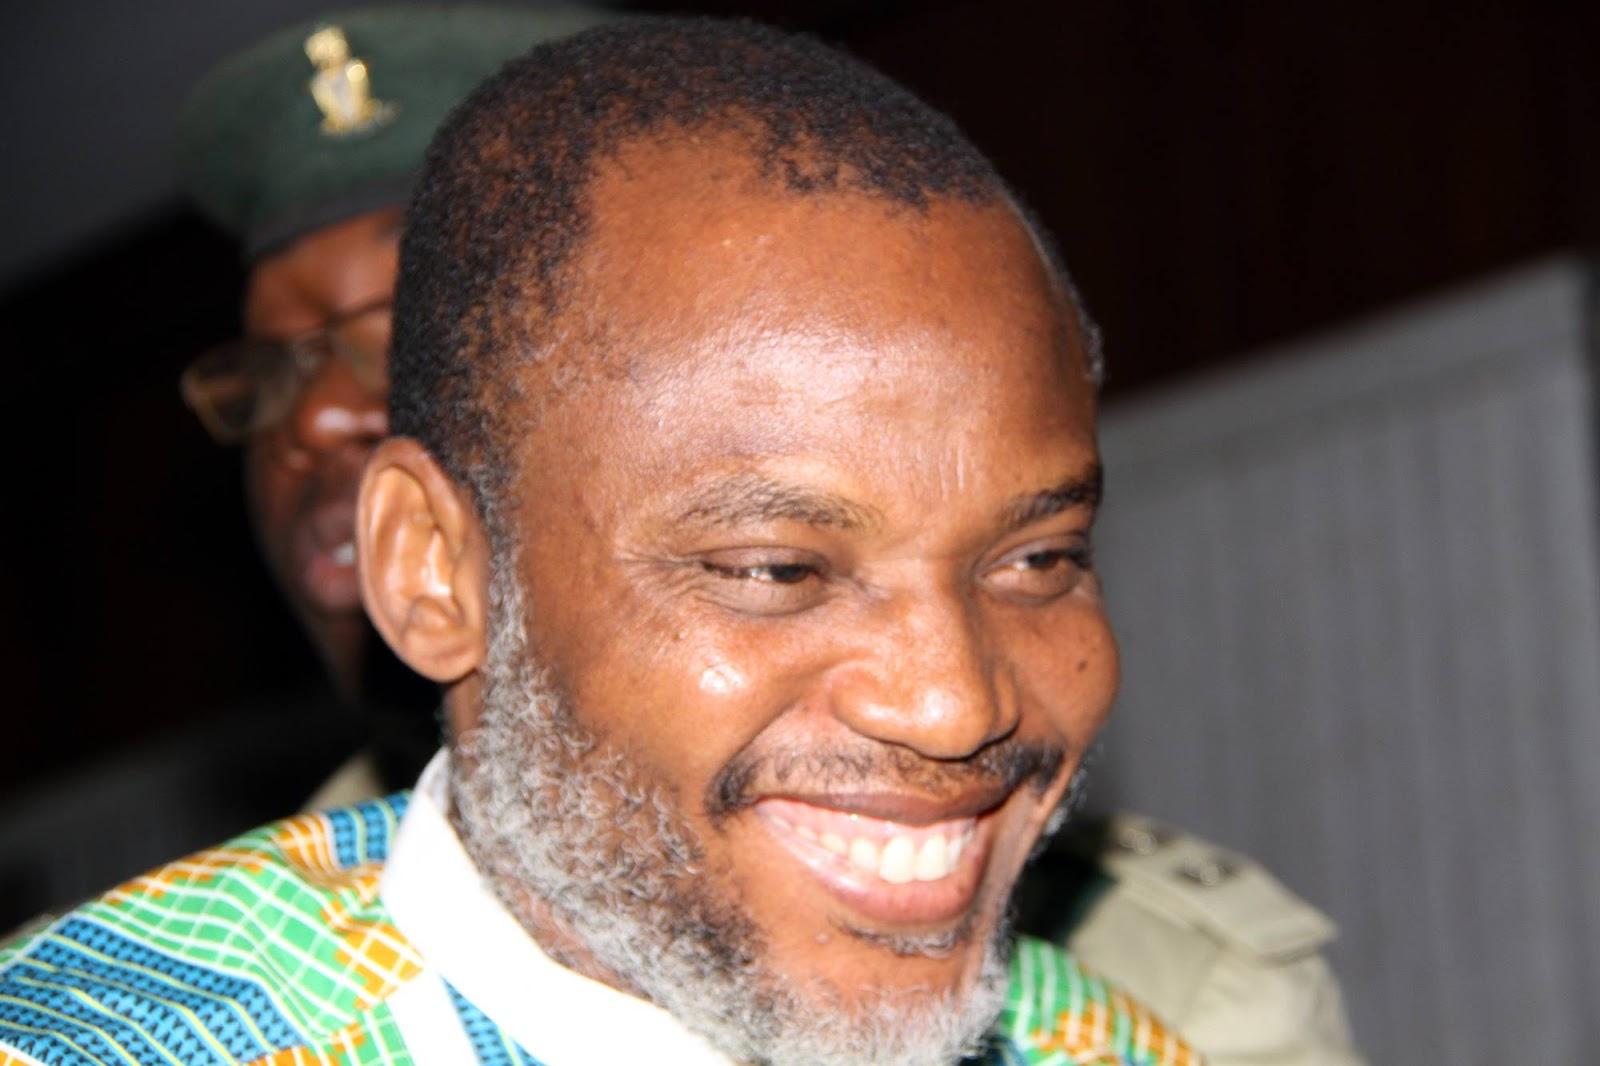 Court grants bail to Biafra leader Nnamdi Kanu | Nigerian